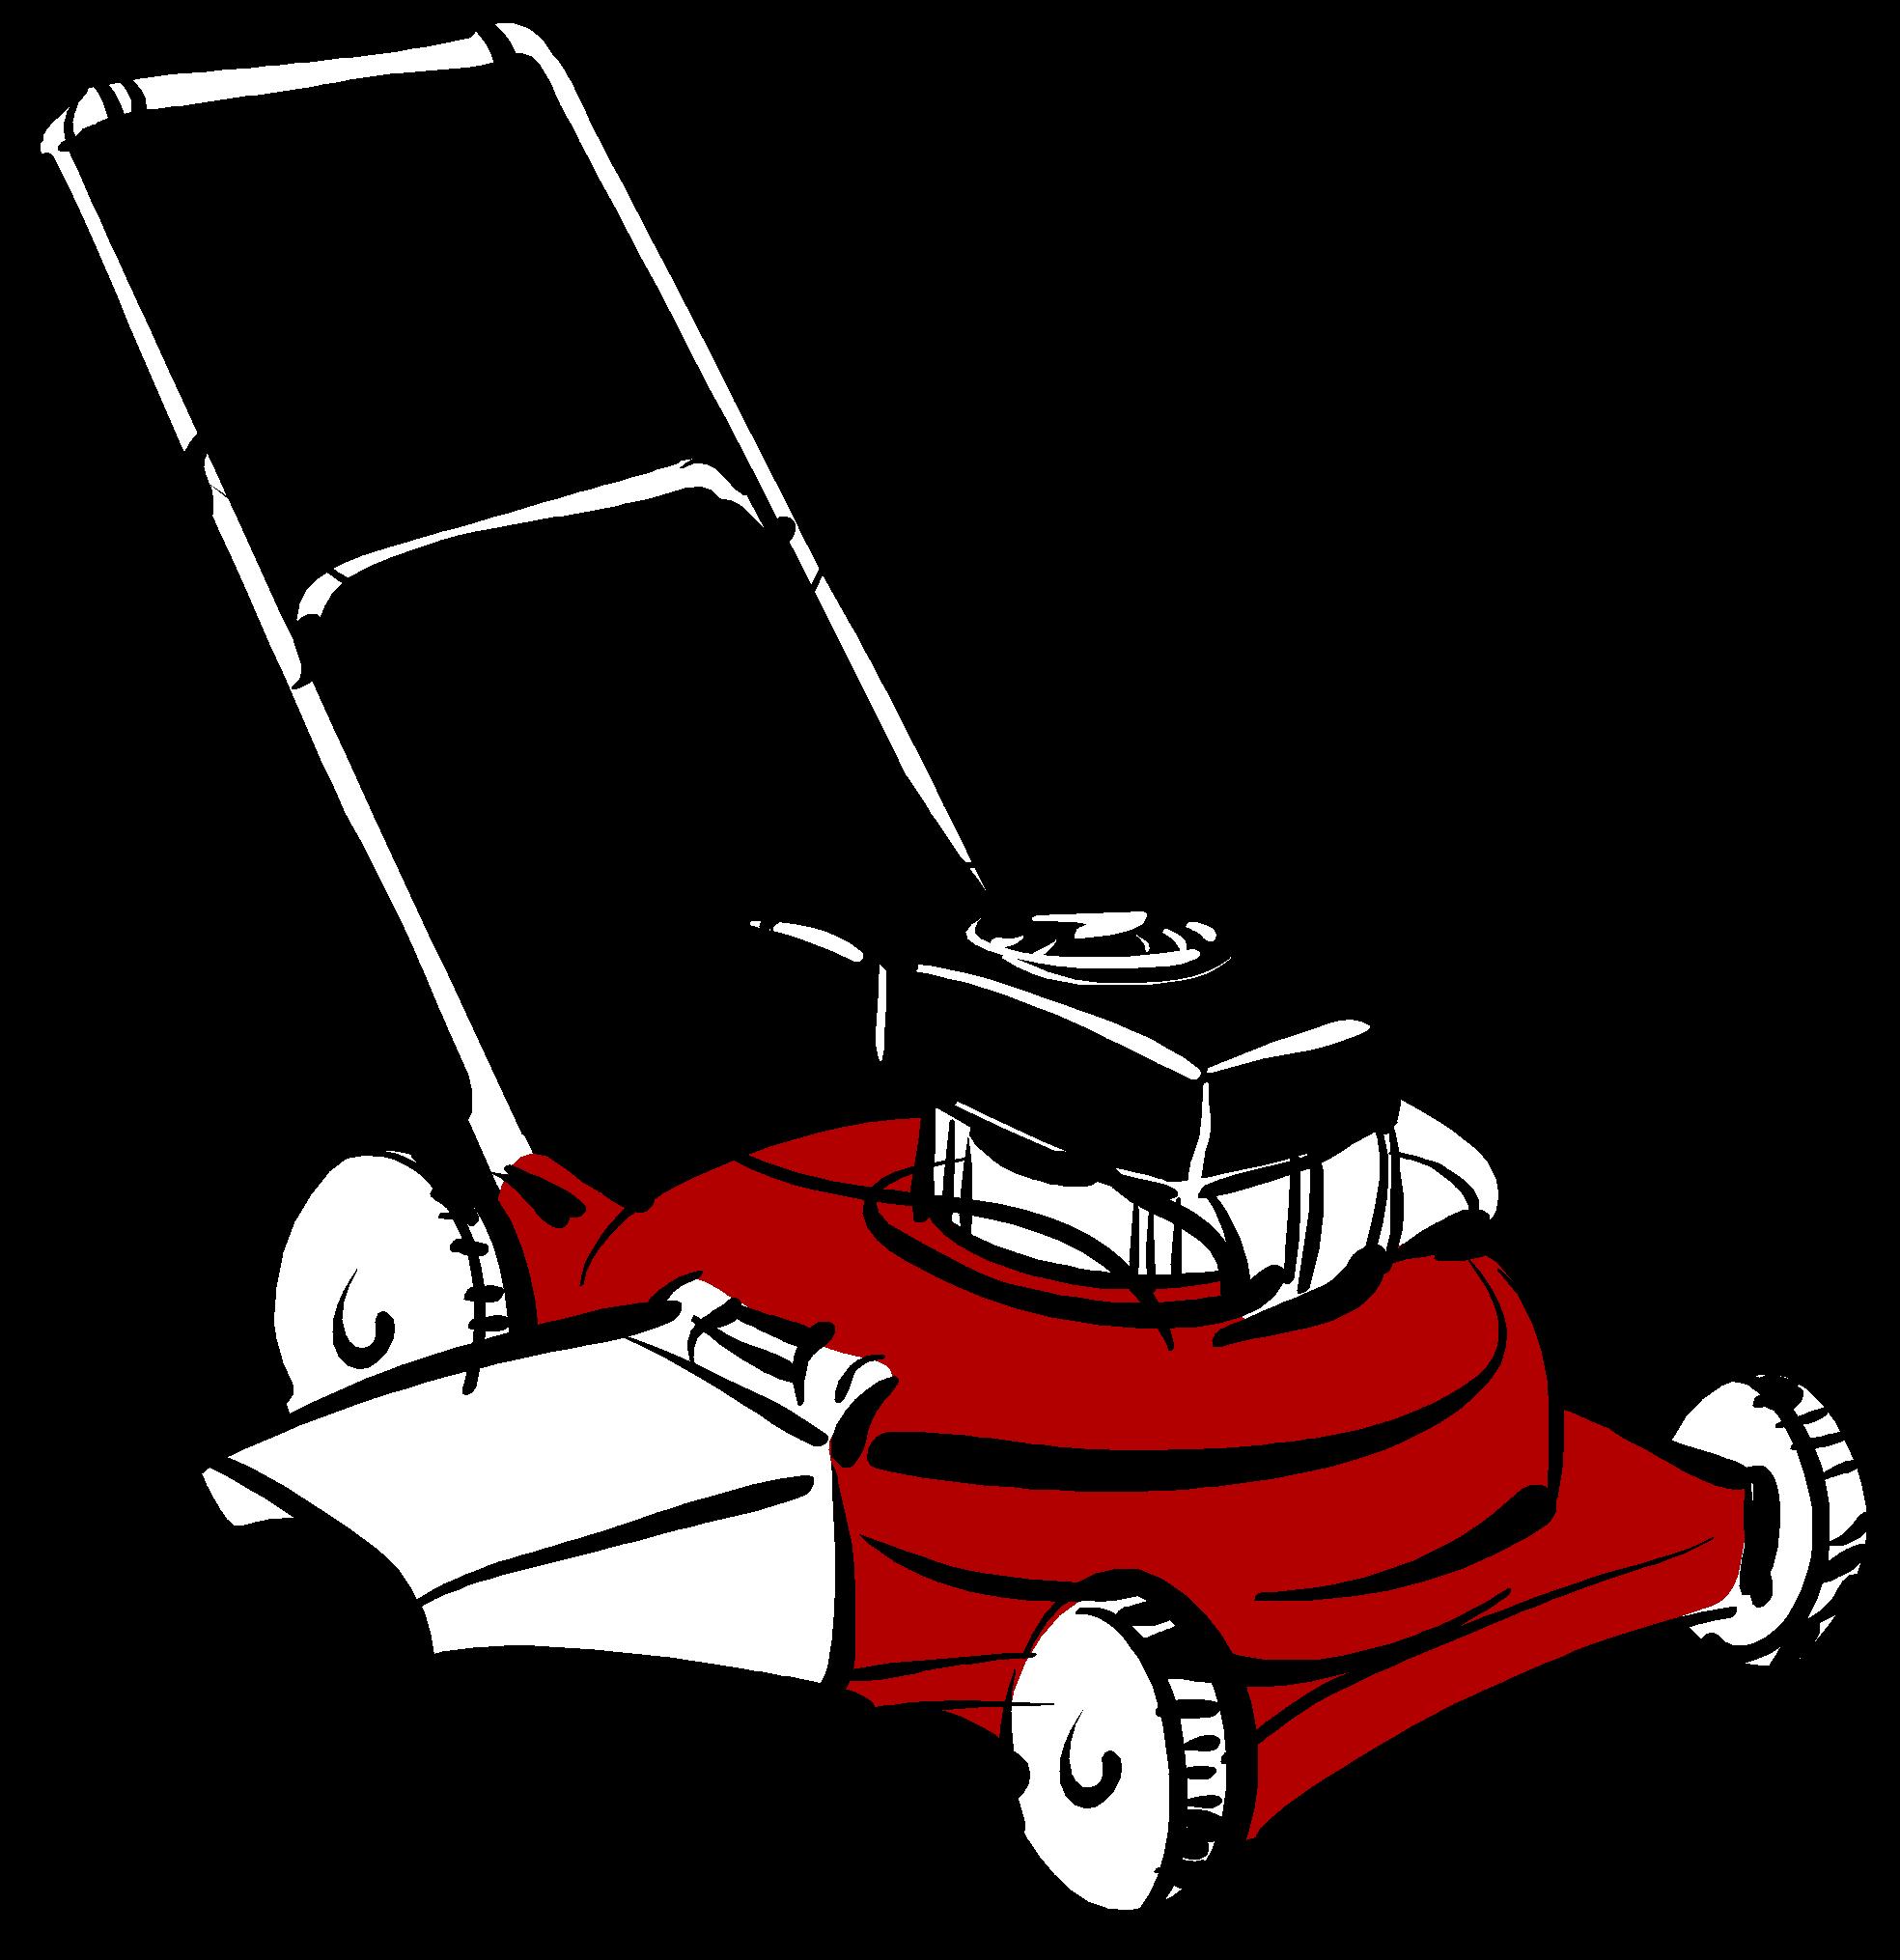 Lawn Mower-Lawn Mower-4